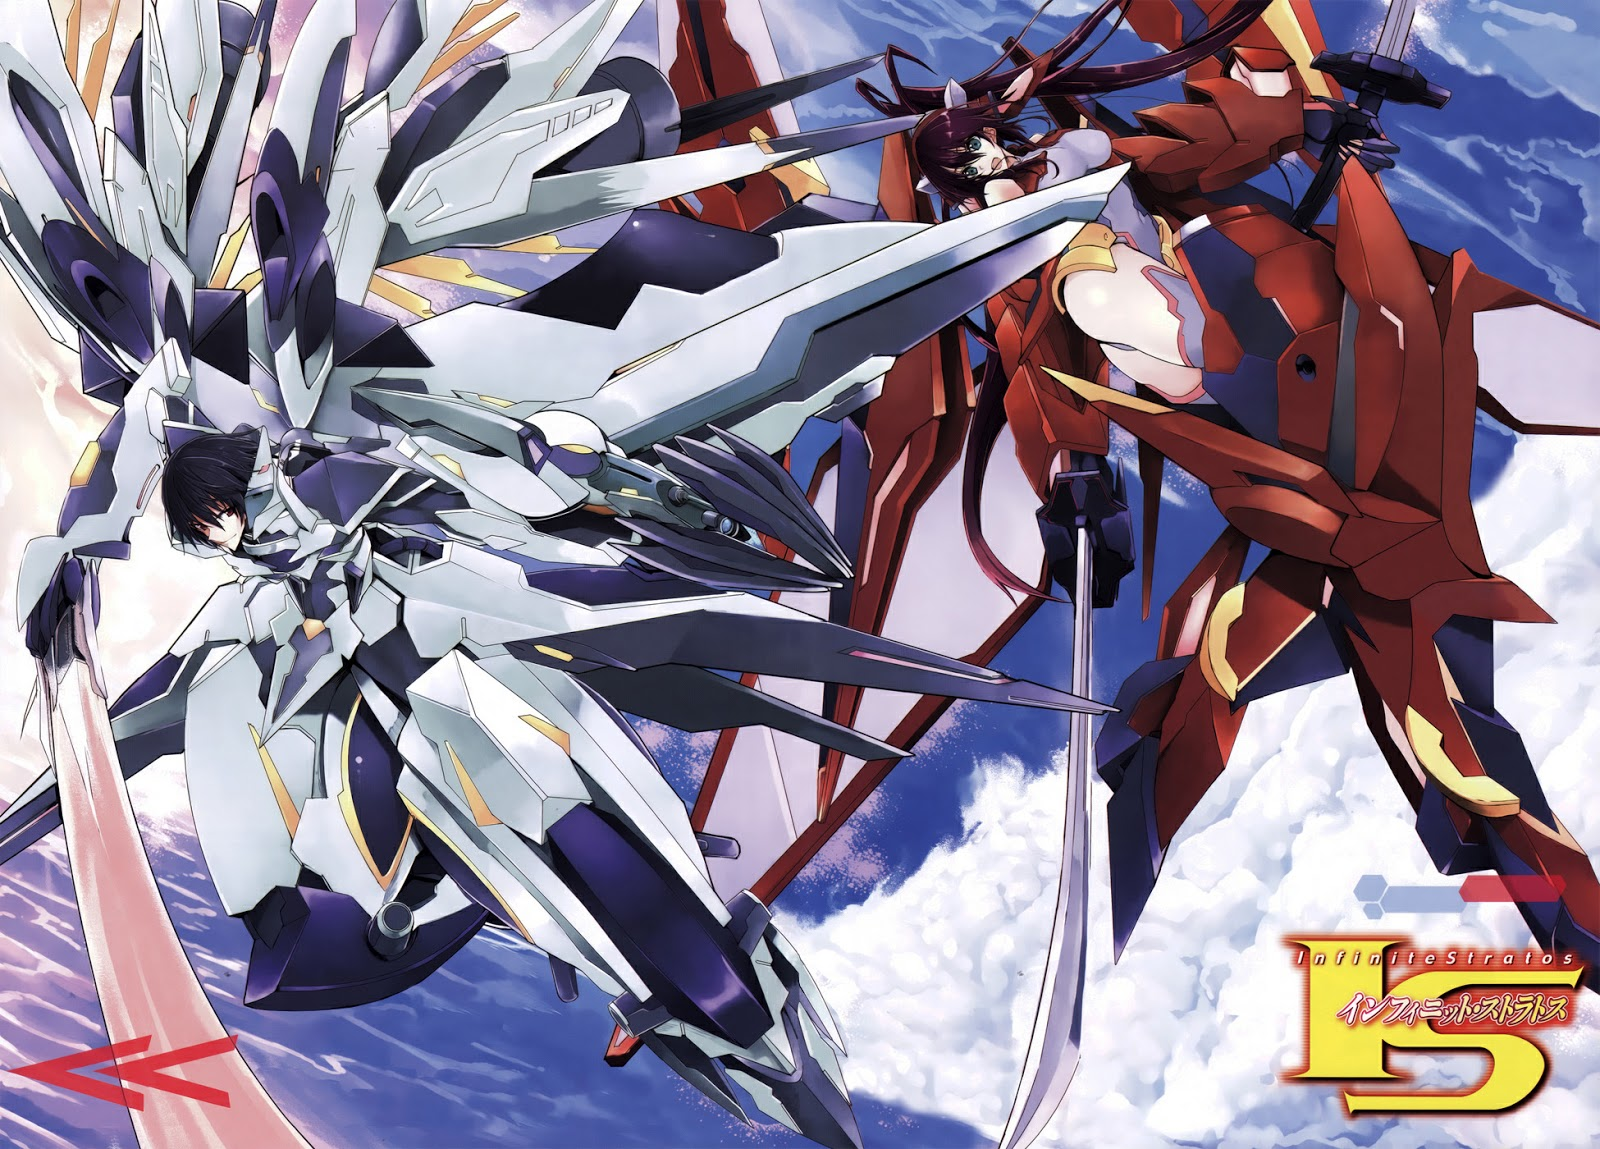 manga wallpapers infinite stratos manga wallpaper